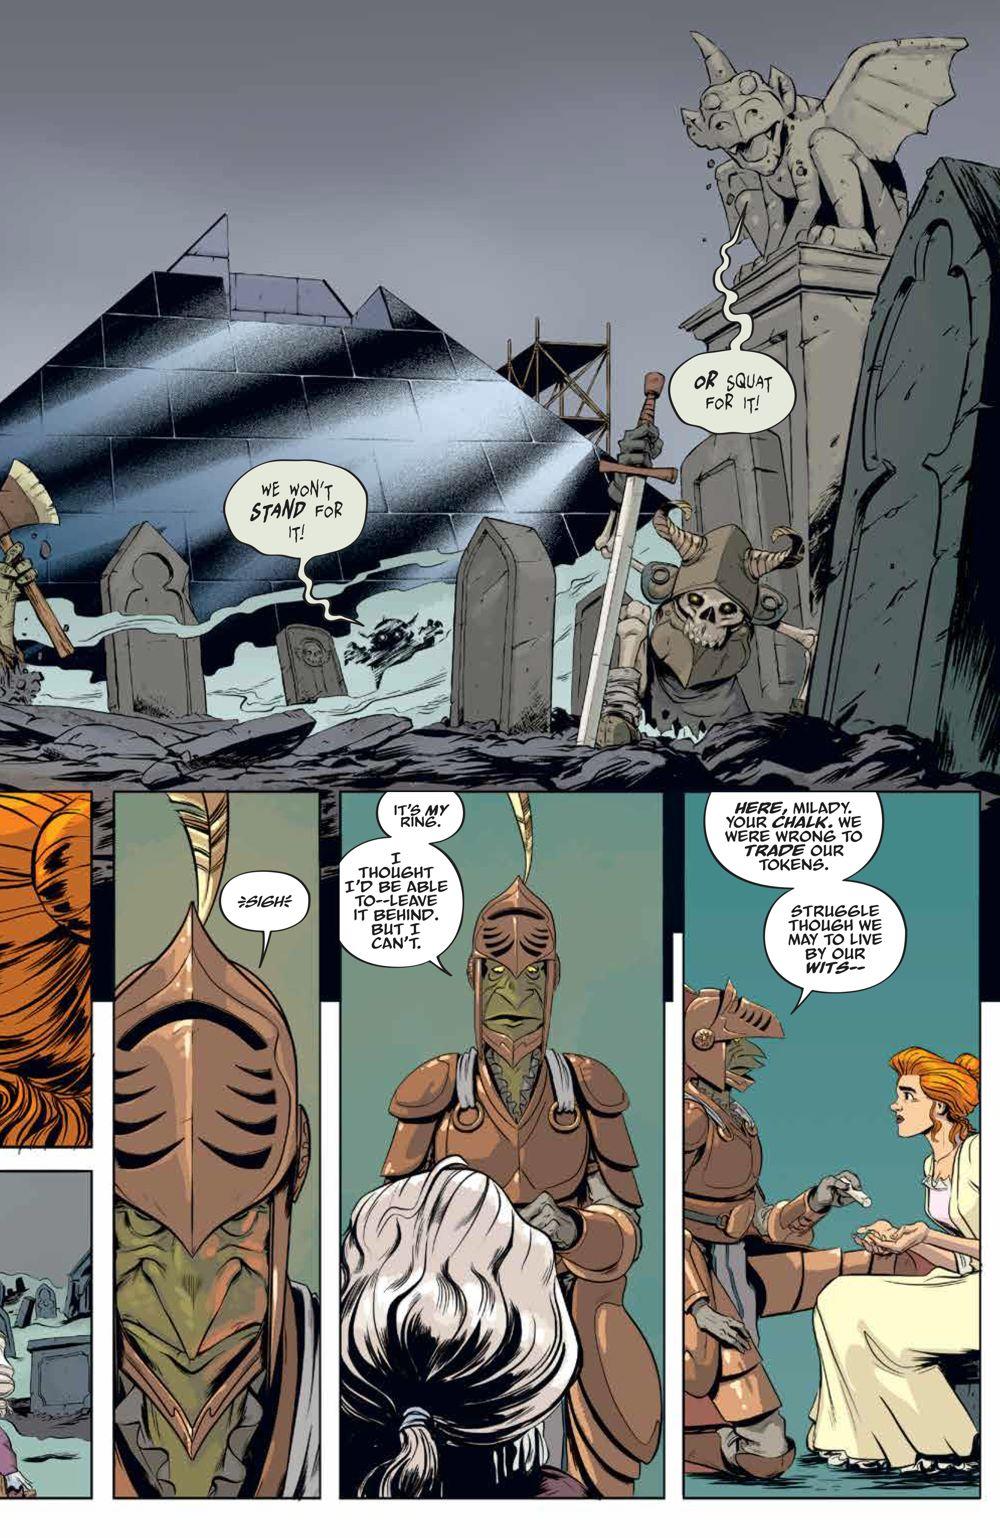 LabyrinthCoronation_v2_SC_PRESS_19 ComicList Previews: JIM HENSON'S LABYRINTH CORONATION VOLUME 2 TP